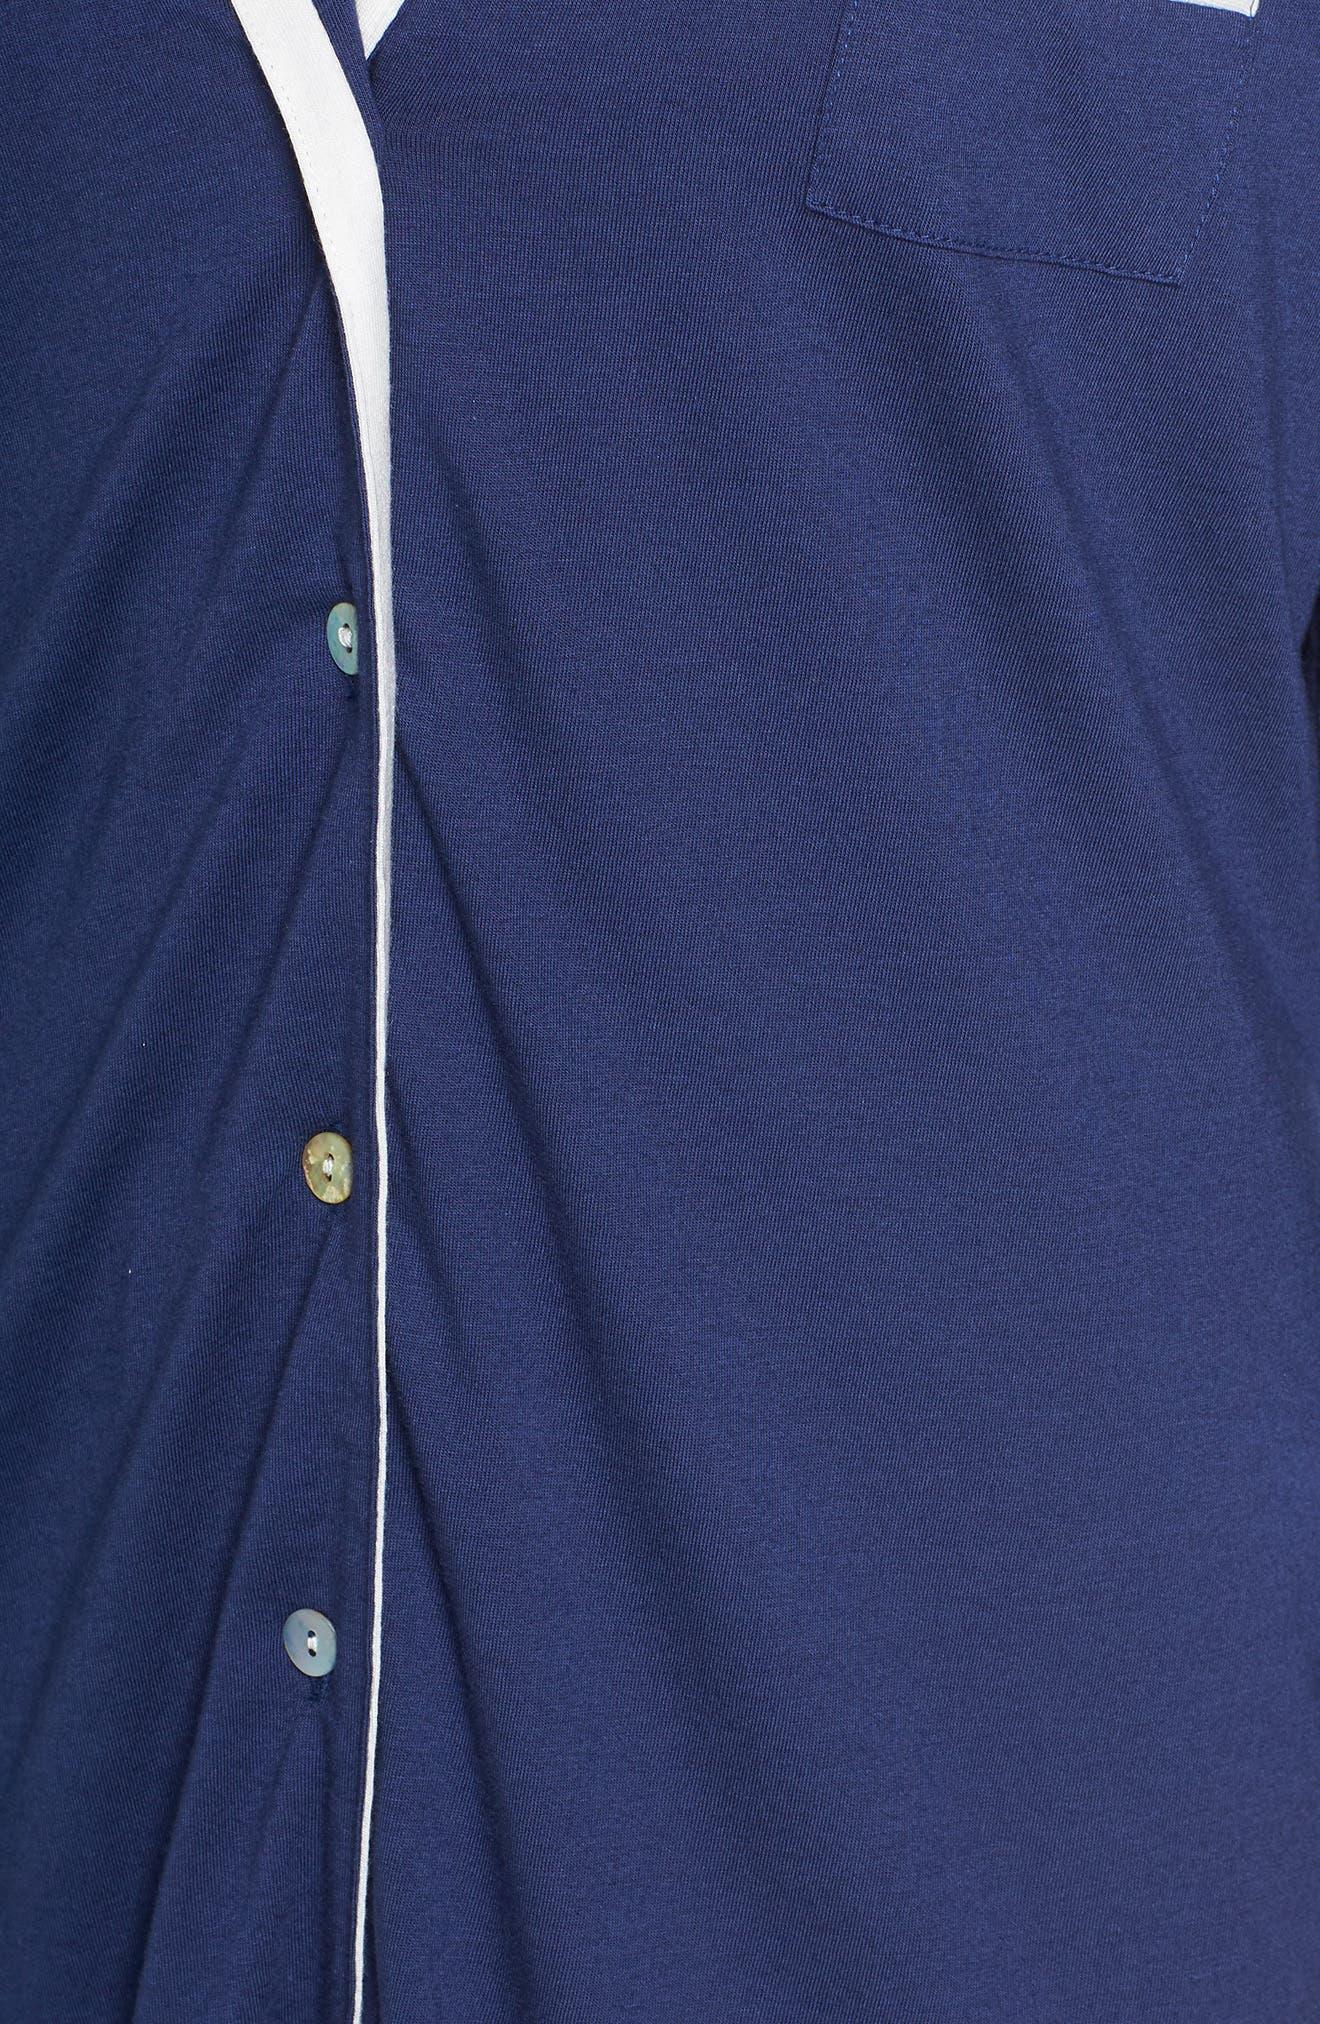 Amore Sleep Shirt,                             Alternate thumbnail 5, color,                             MARINE BLUE MOON/ IVORY